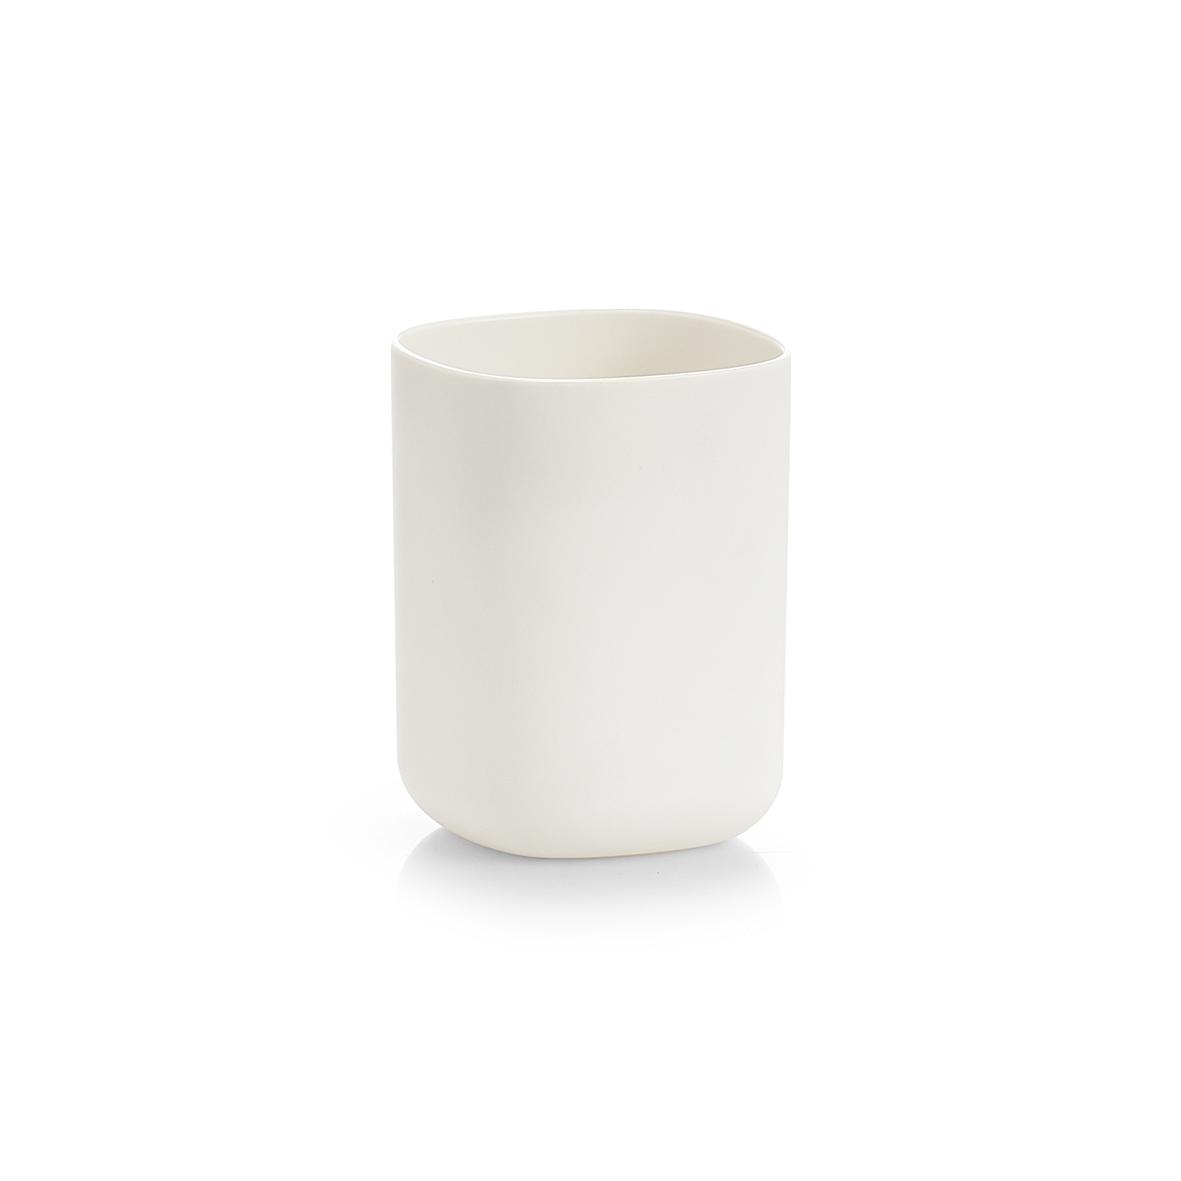 Poza Pahar din plastic pentru periuta de dinti, Wellness Alb, L7,3xl7,3xH9,5 cm